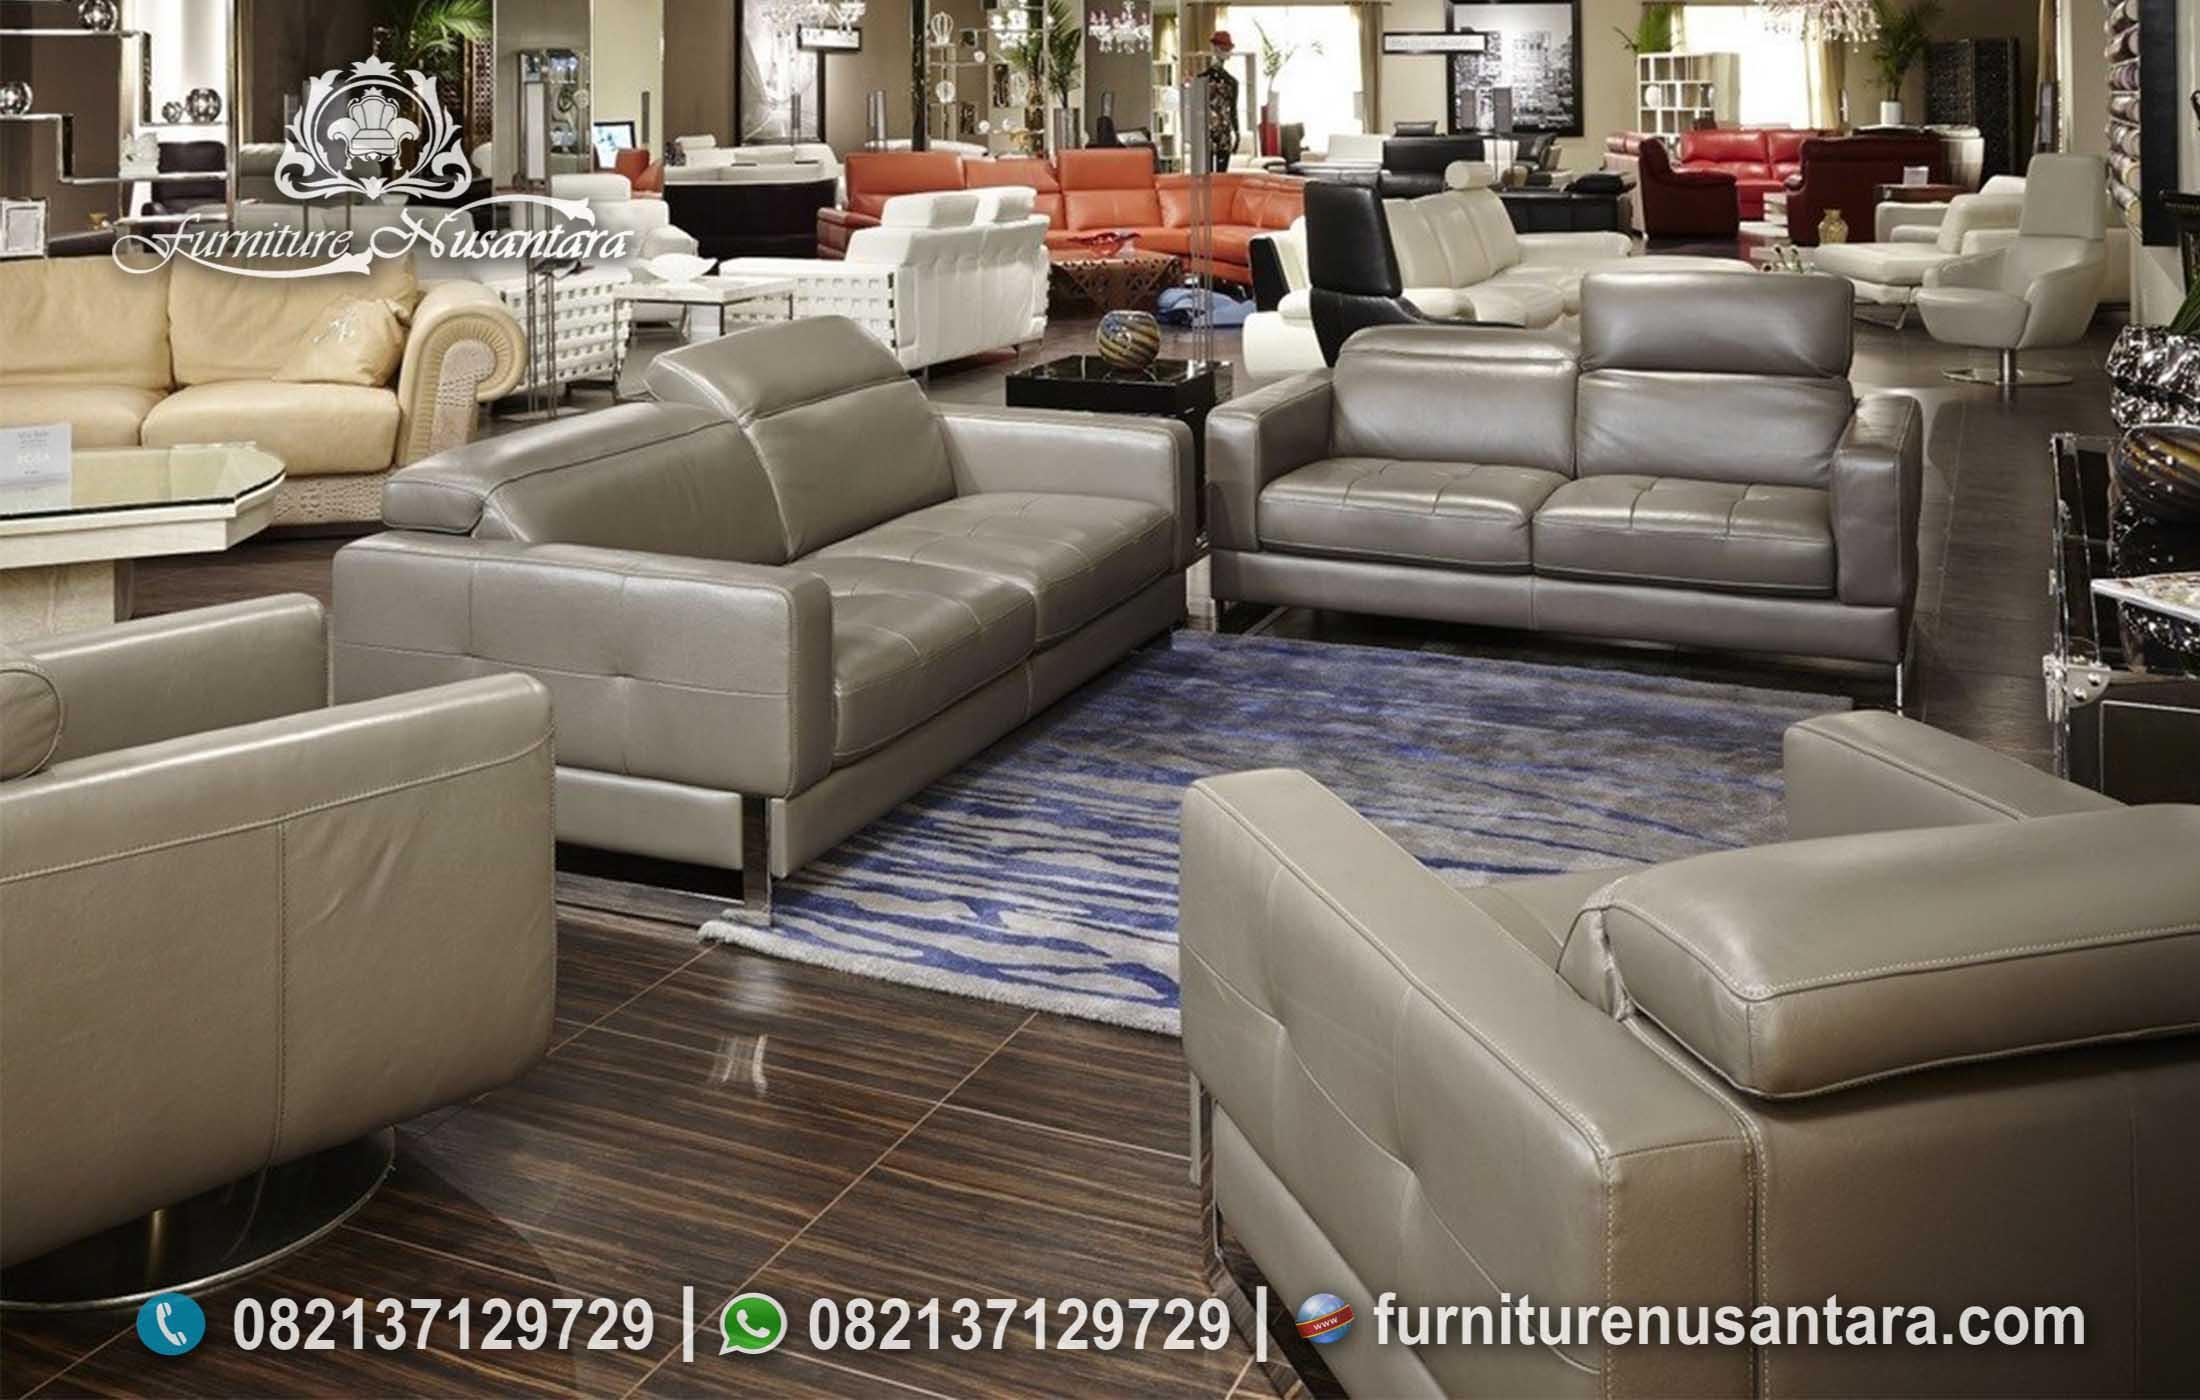 Sofa Bed Minimalis Italian Leather ST-94, Furniture Nusantara